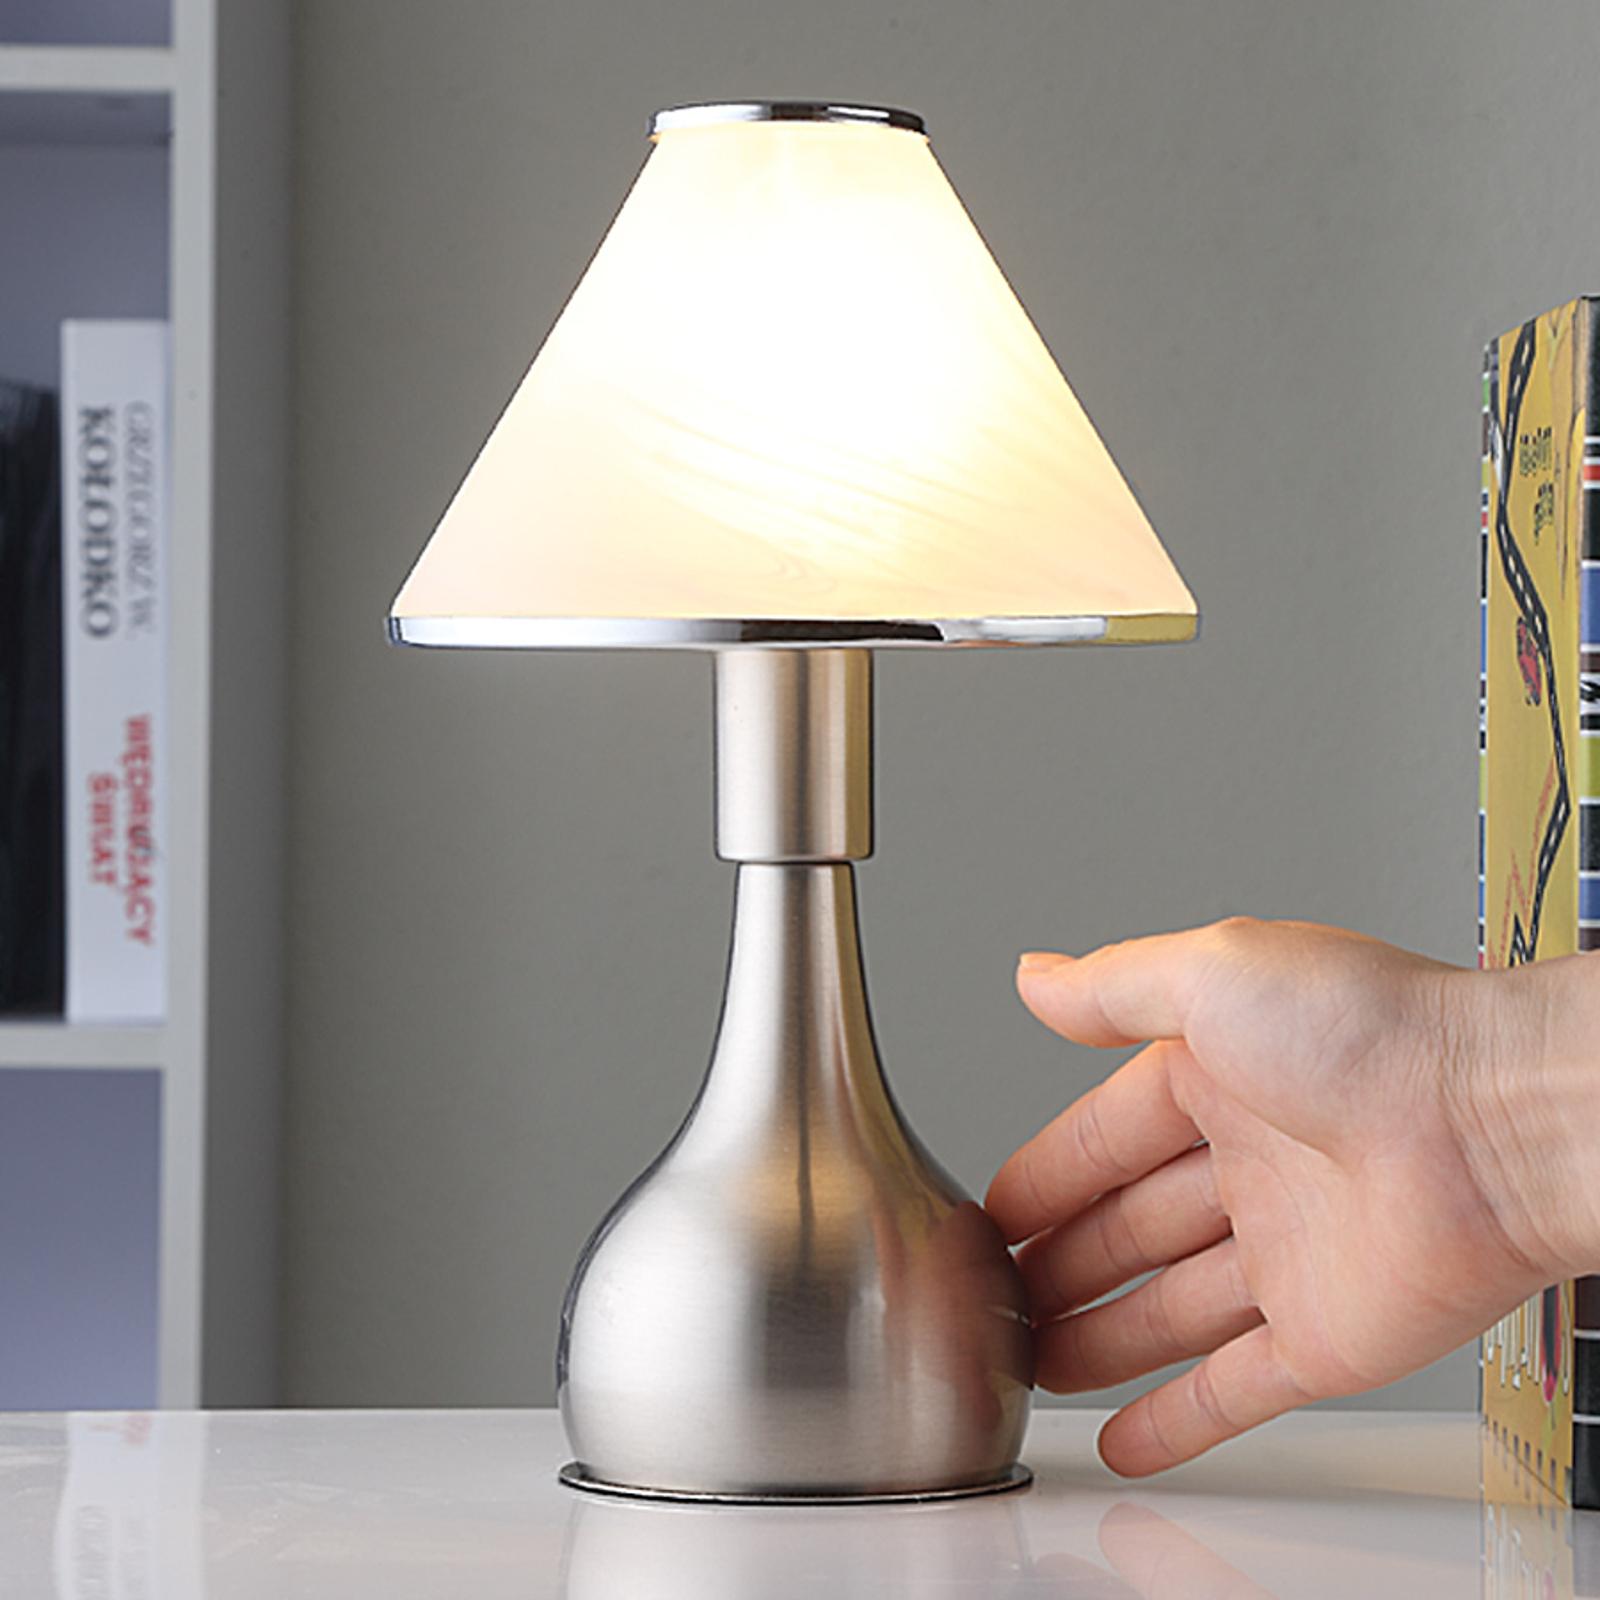 Lampka nocna Ellen ze szkła i metalu